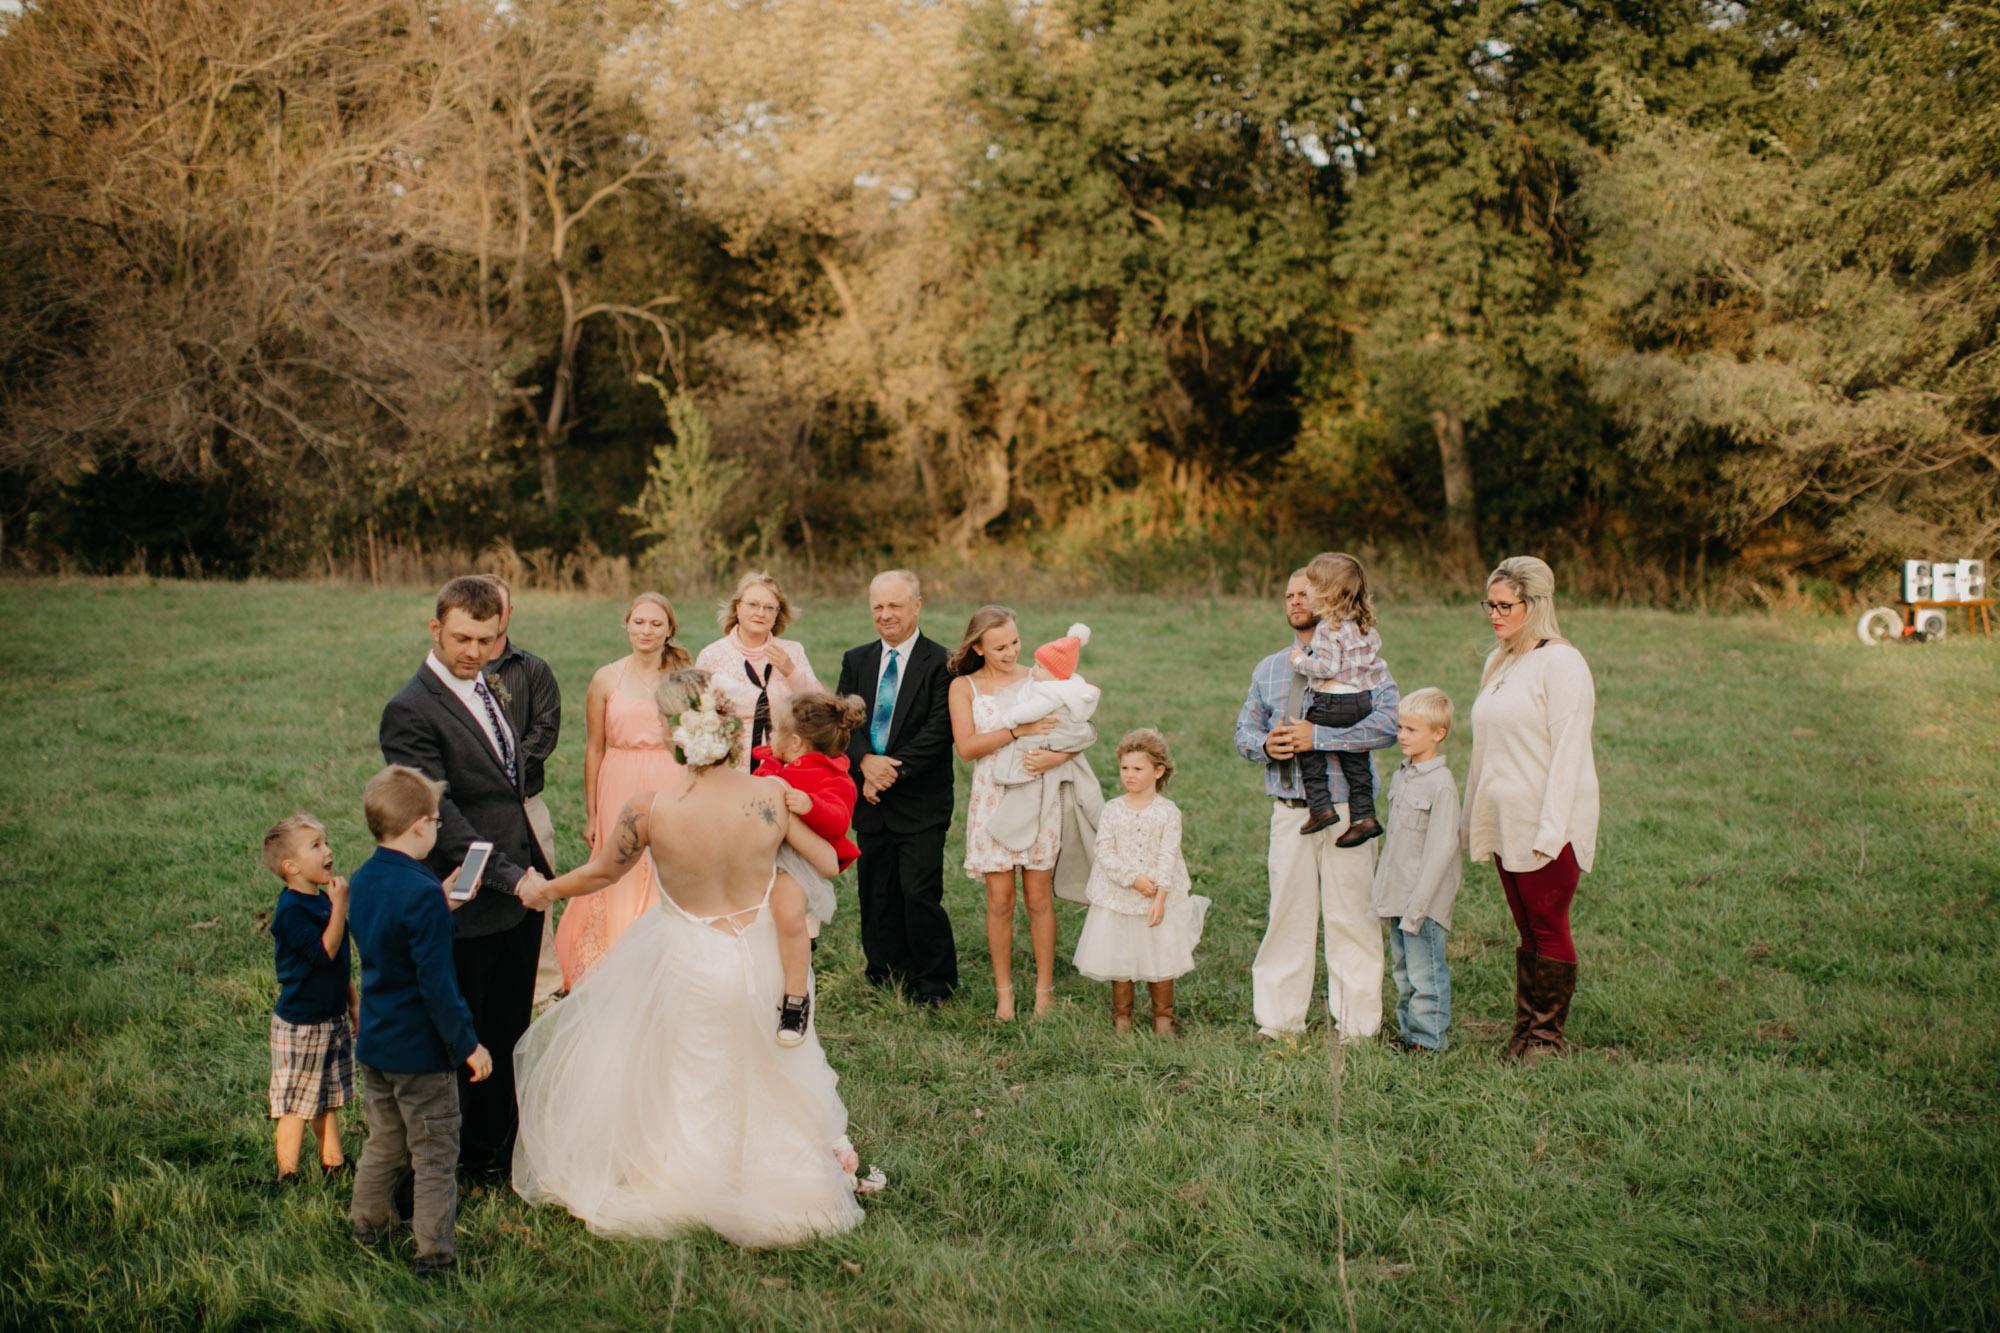 omaha-wedding-photographer-meghan-time-45.jpg